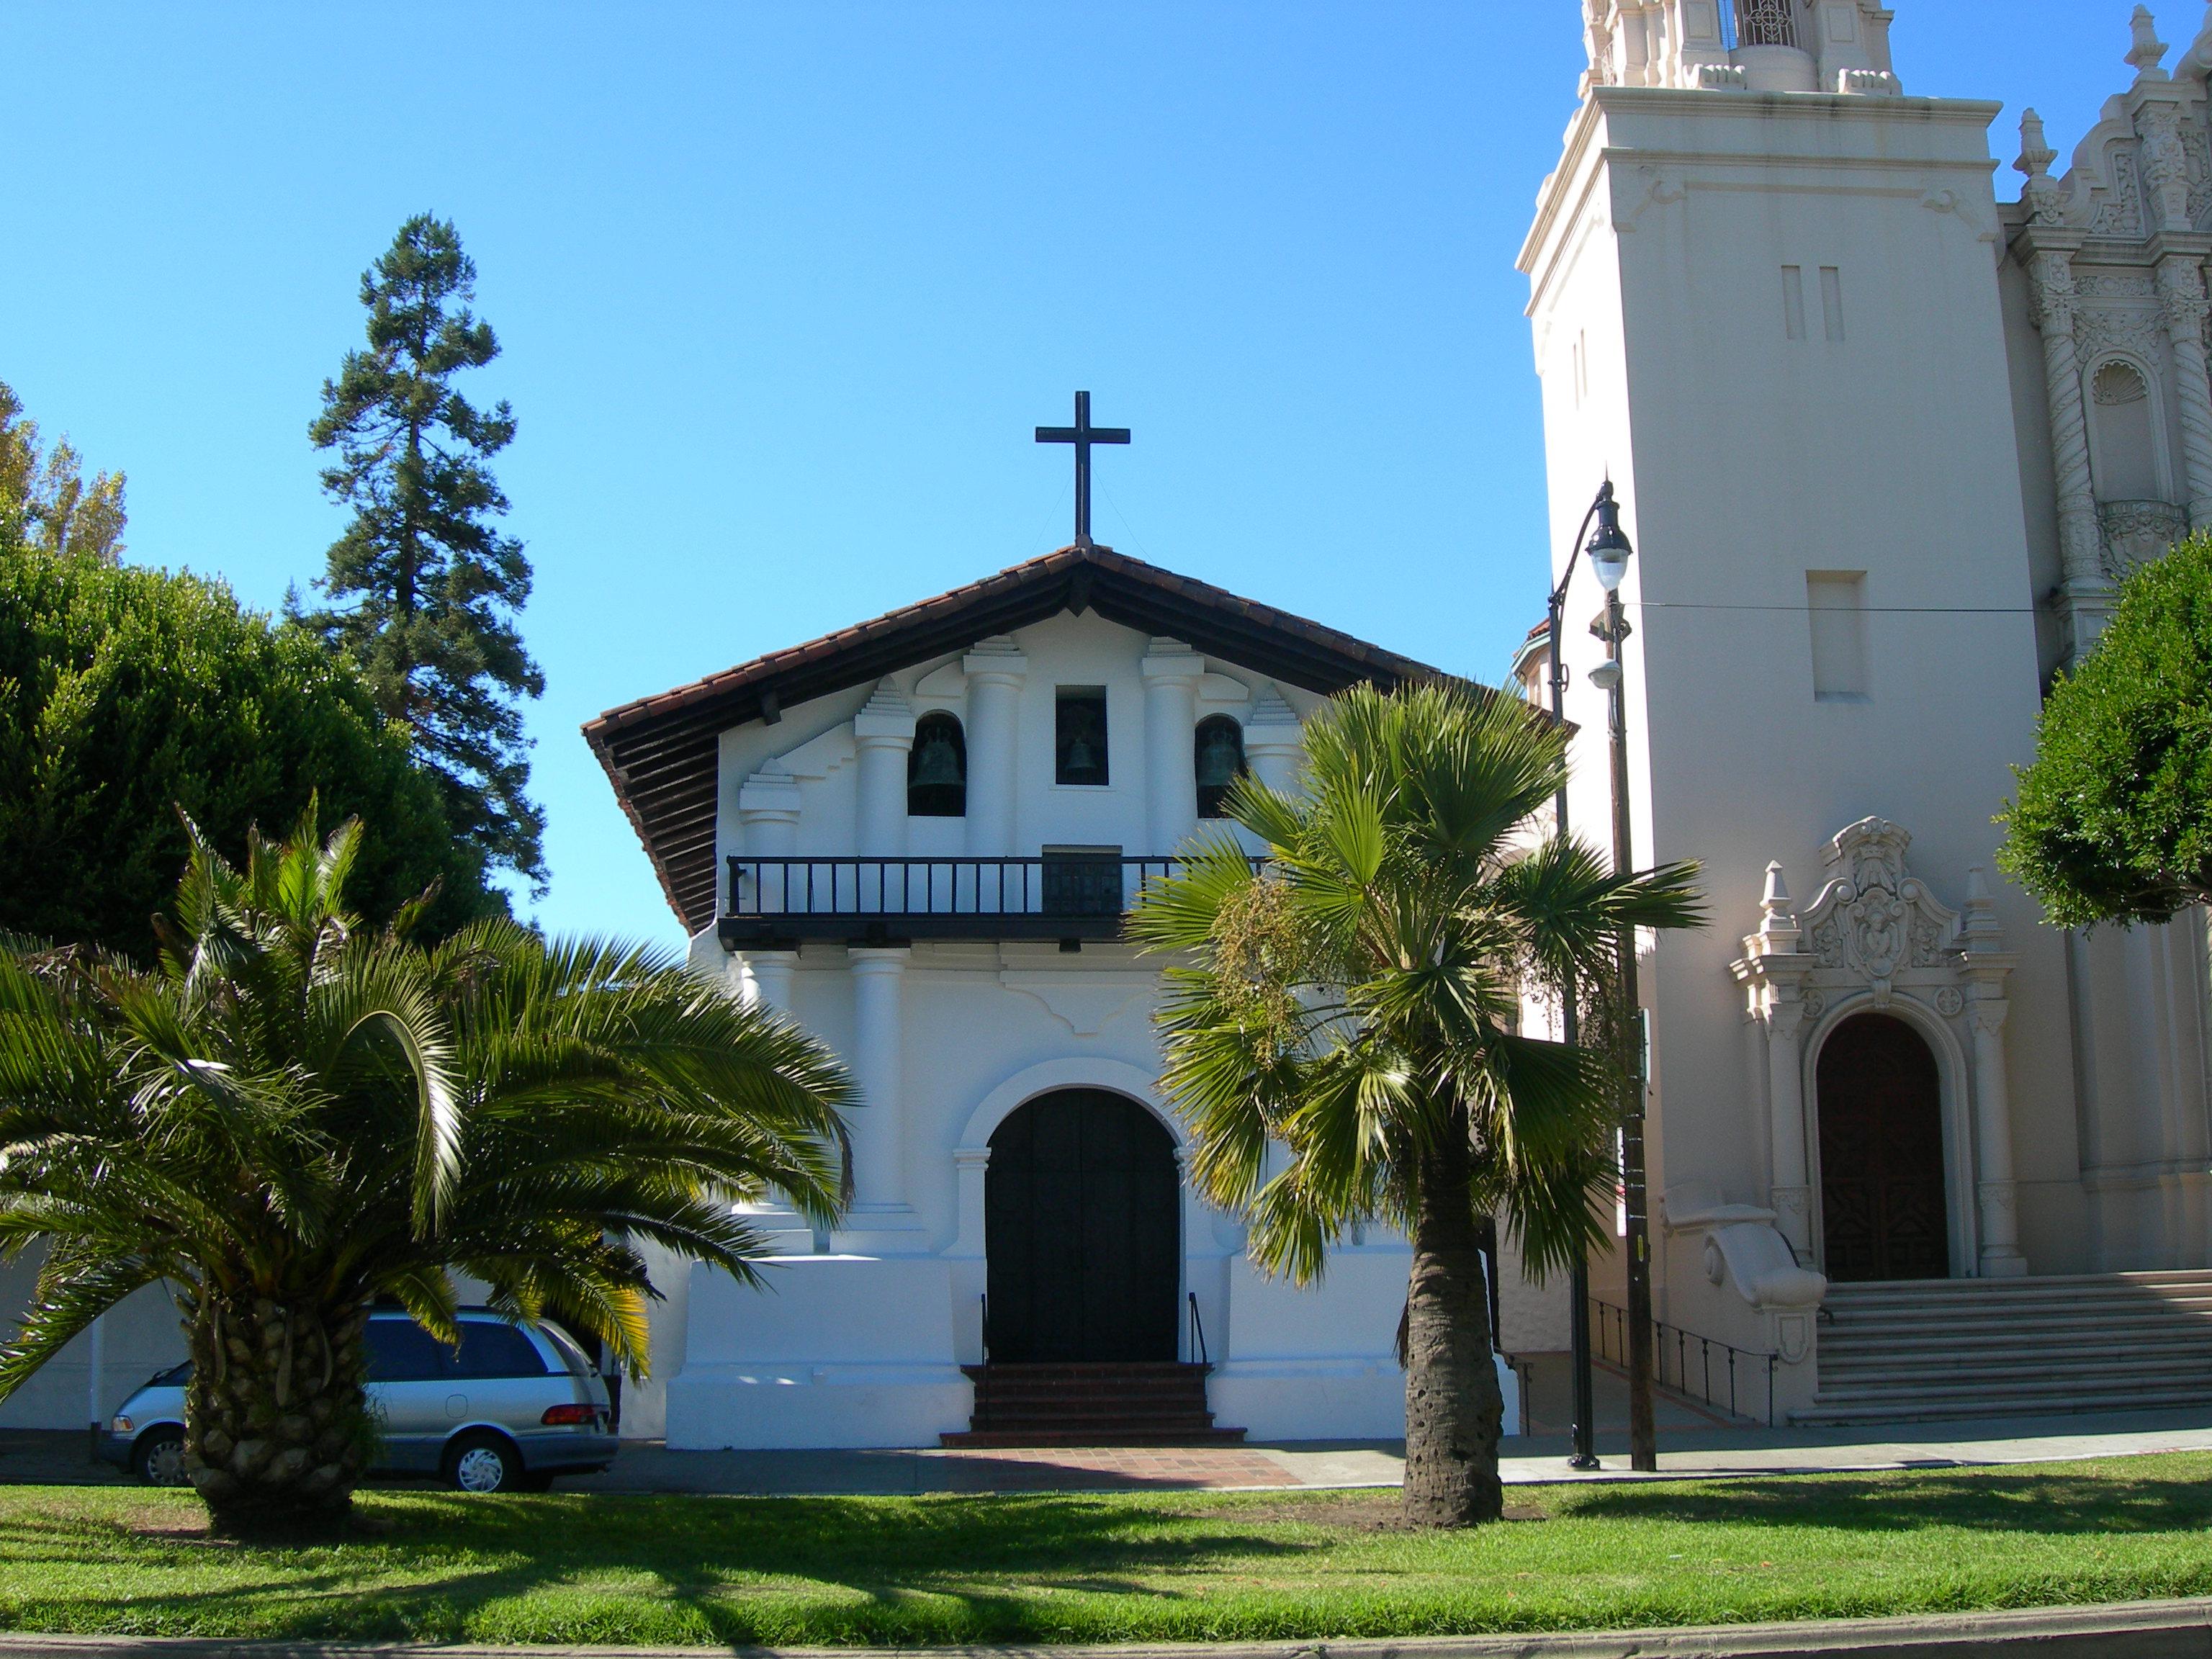 Mission Dolores in San Francisco, Adobe, Church, Cross, Francisco, HQ Photo